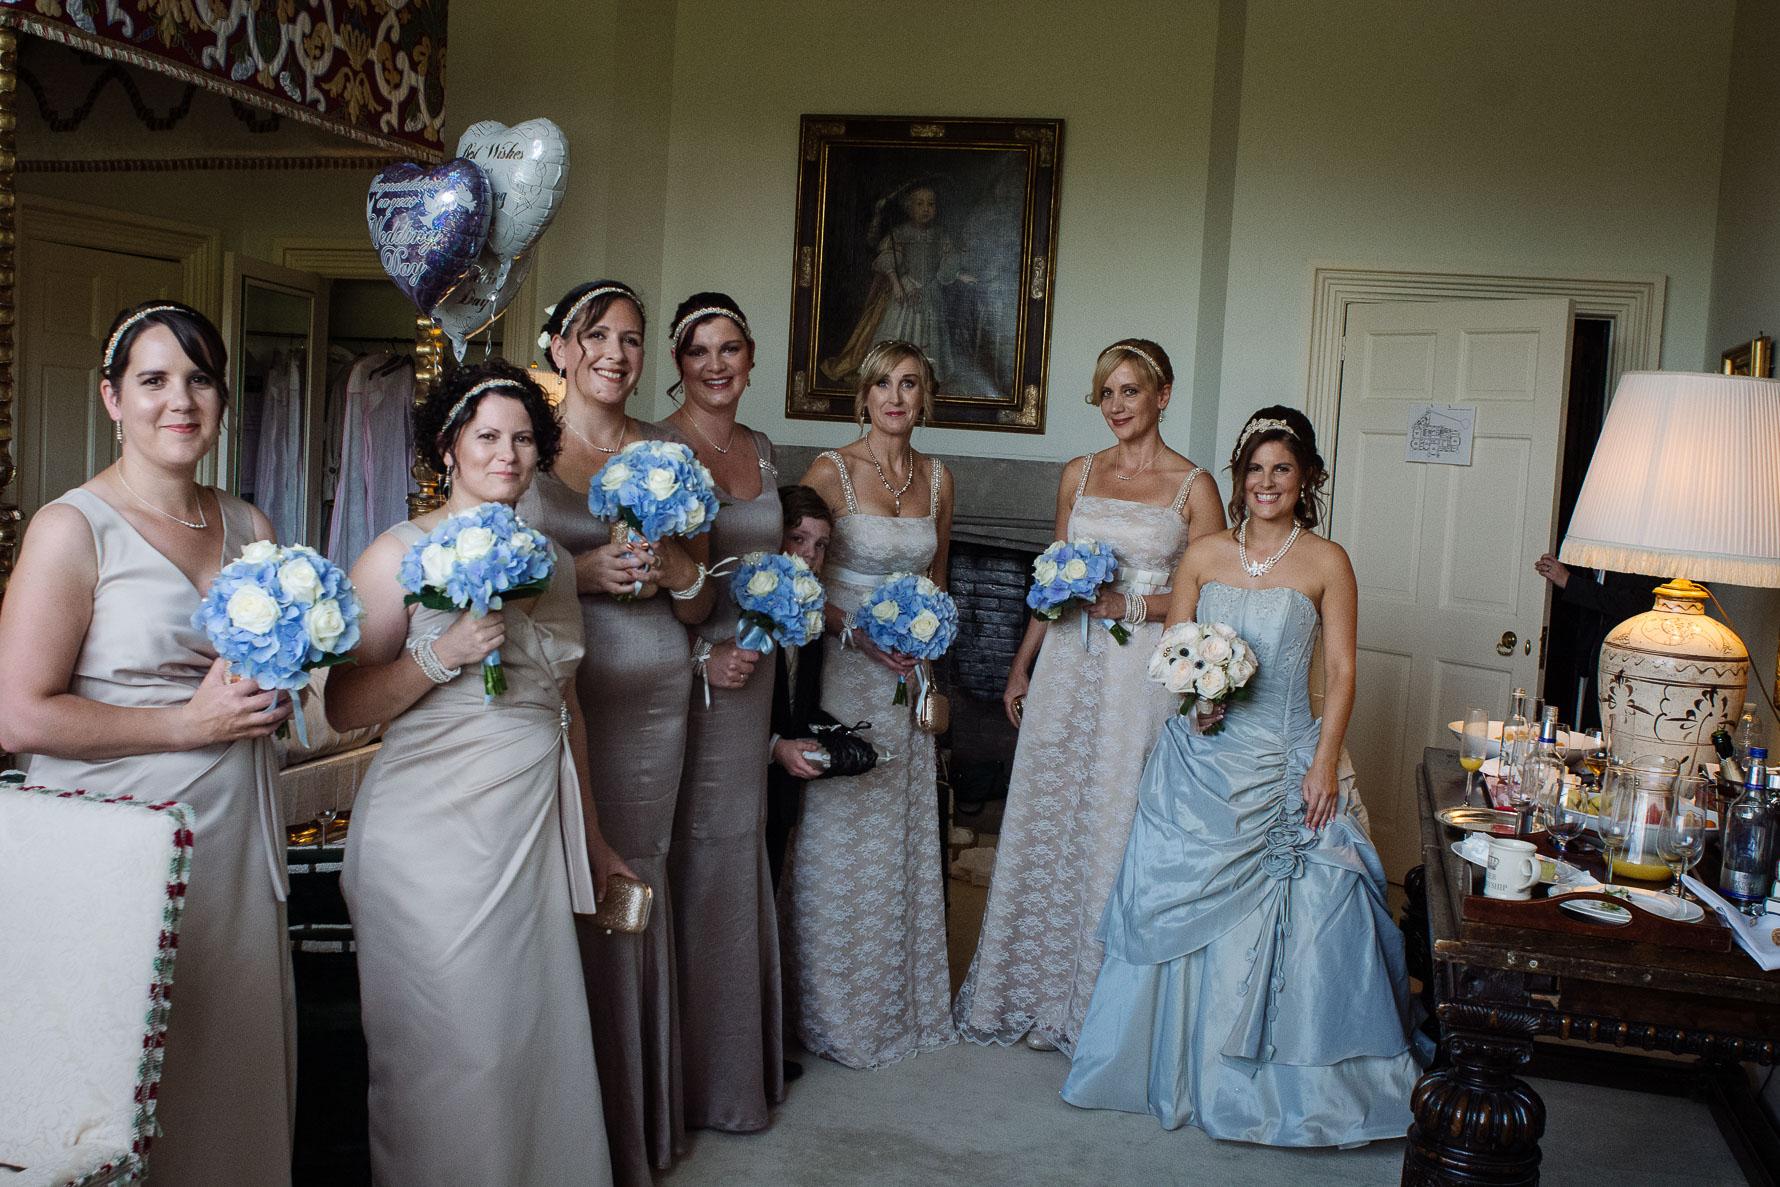 Leeds Castle Wedding10-20140919 0307